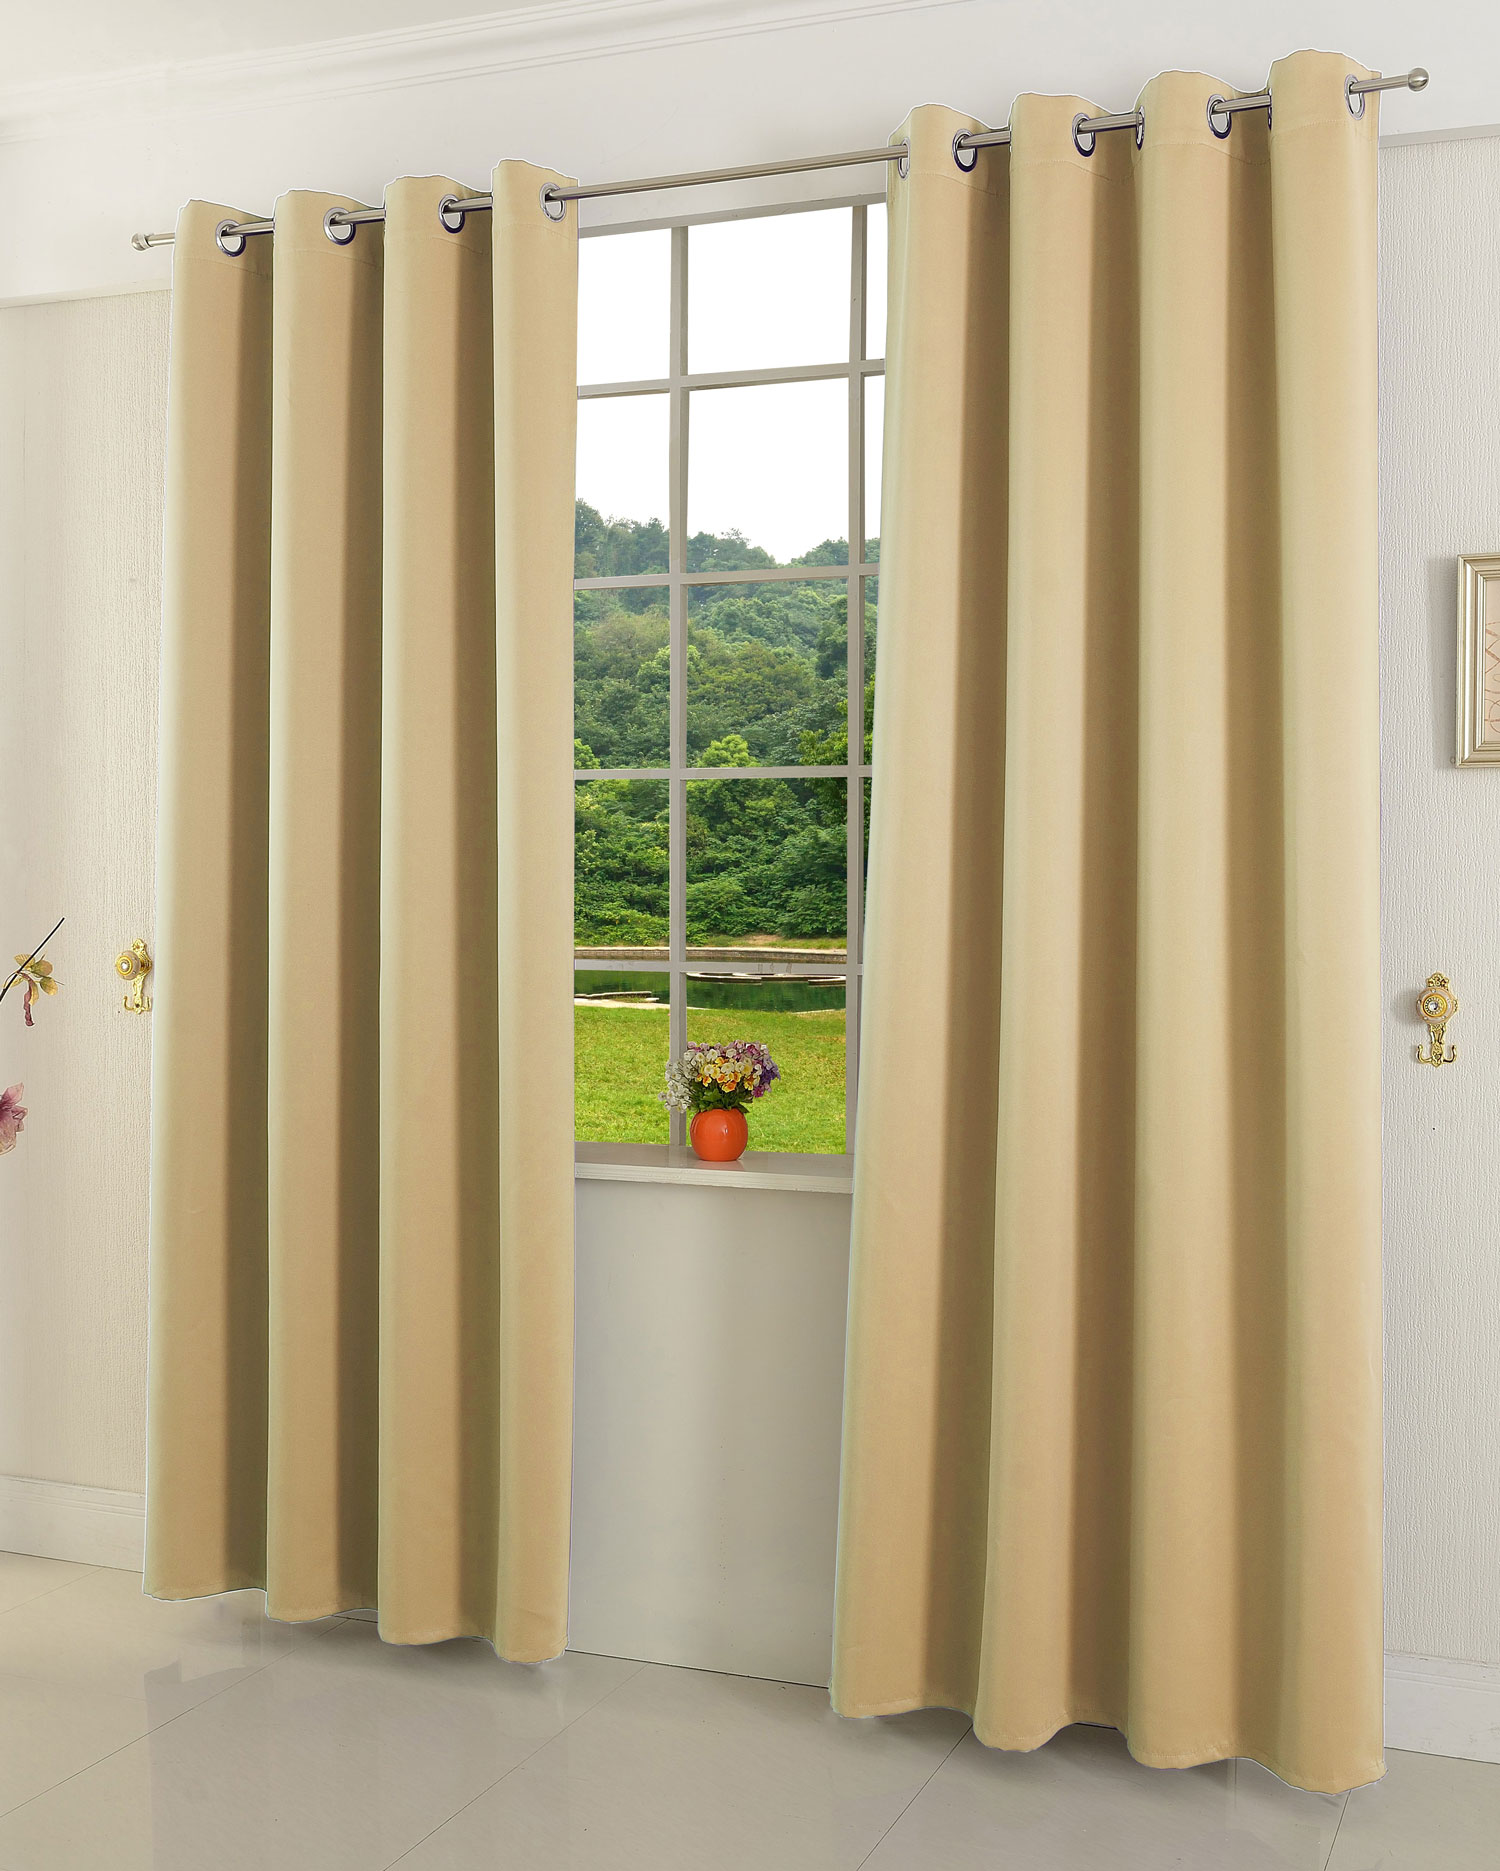 verdunklungsgardine blickdicht thermo verdunklungsvorhang blackout 206000 ebay. Black Bedroom Furniture Sets. Home Design Ideas